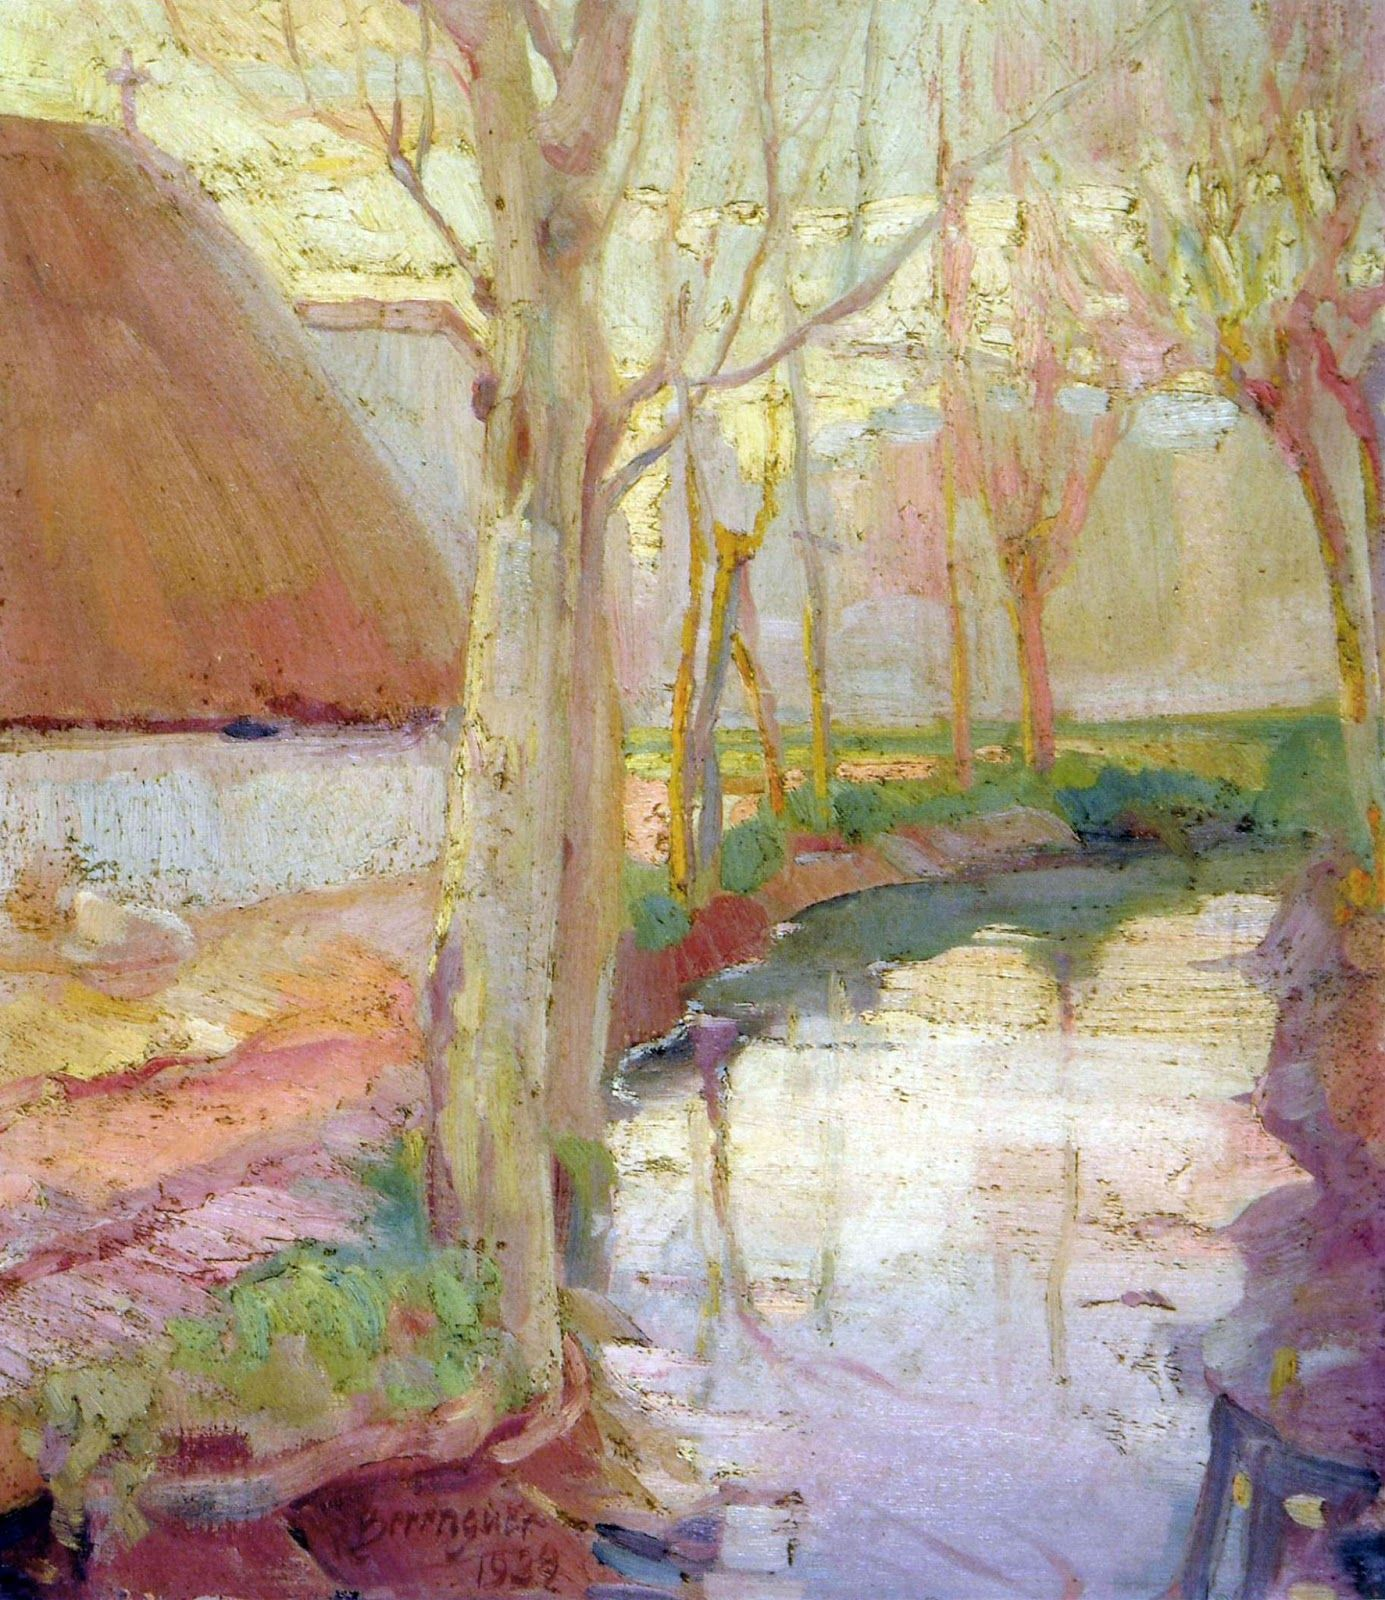 Rafael Berenguer Coloma 1890 - 1940) | MASTER ART painters | Pinterest